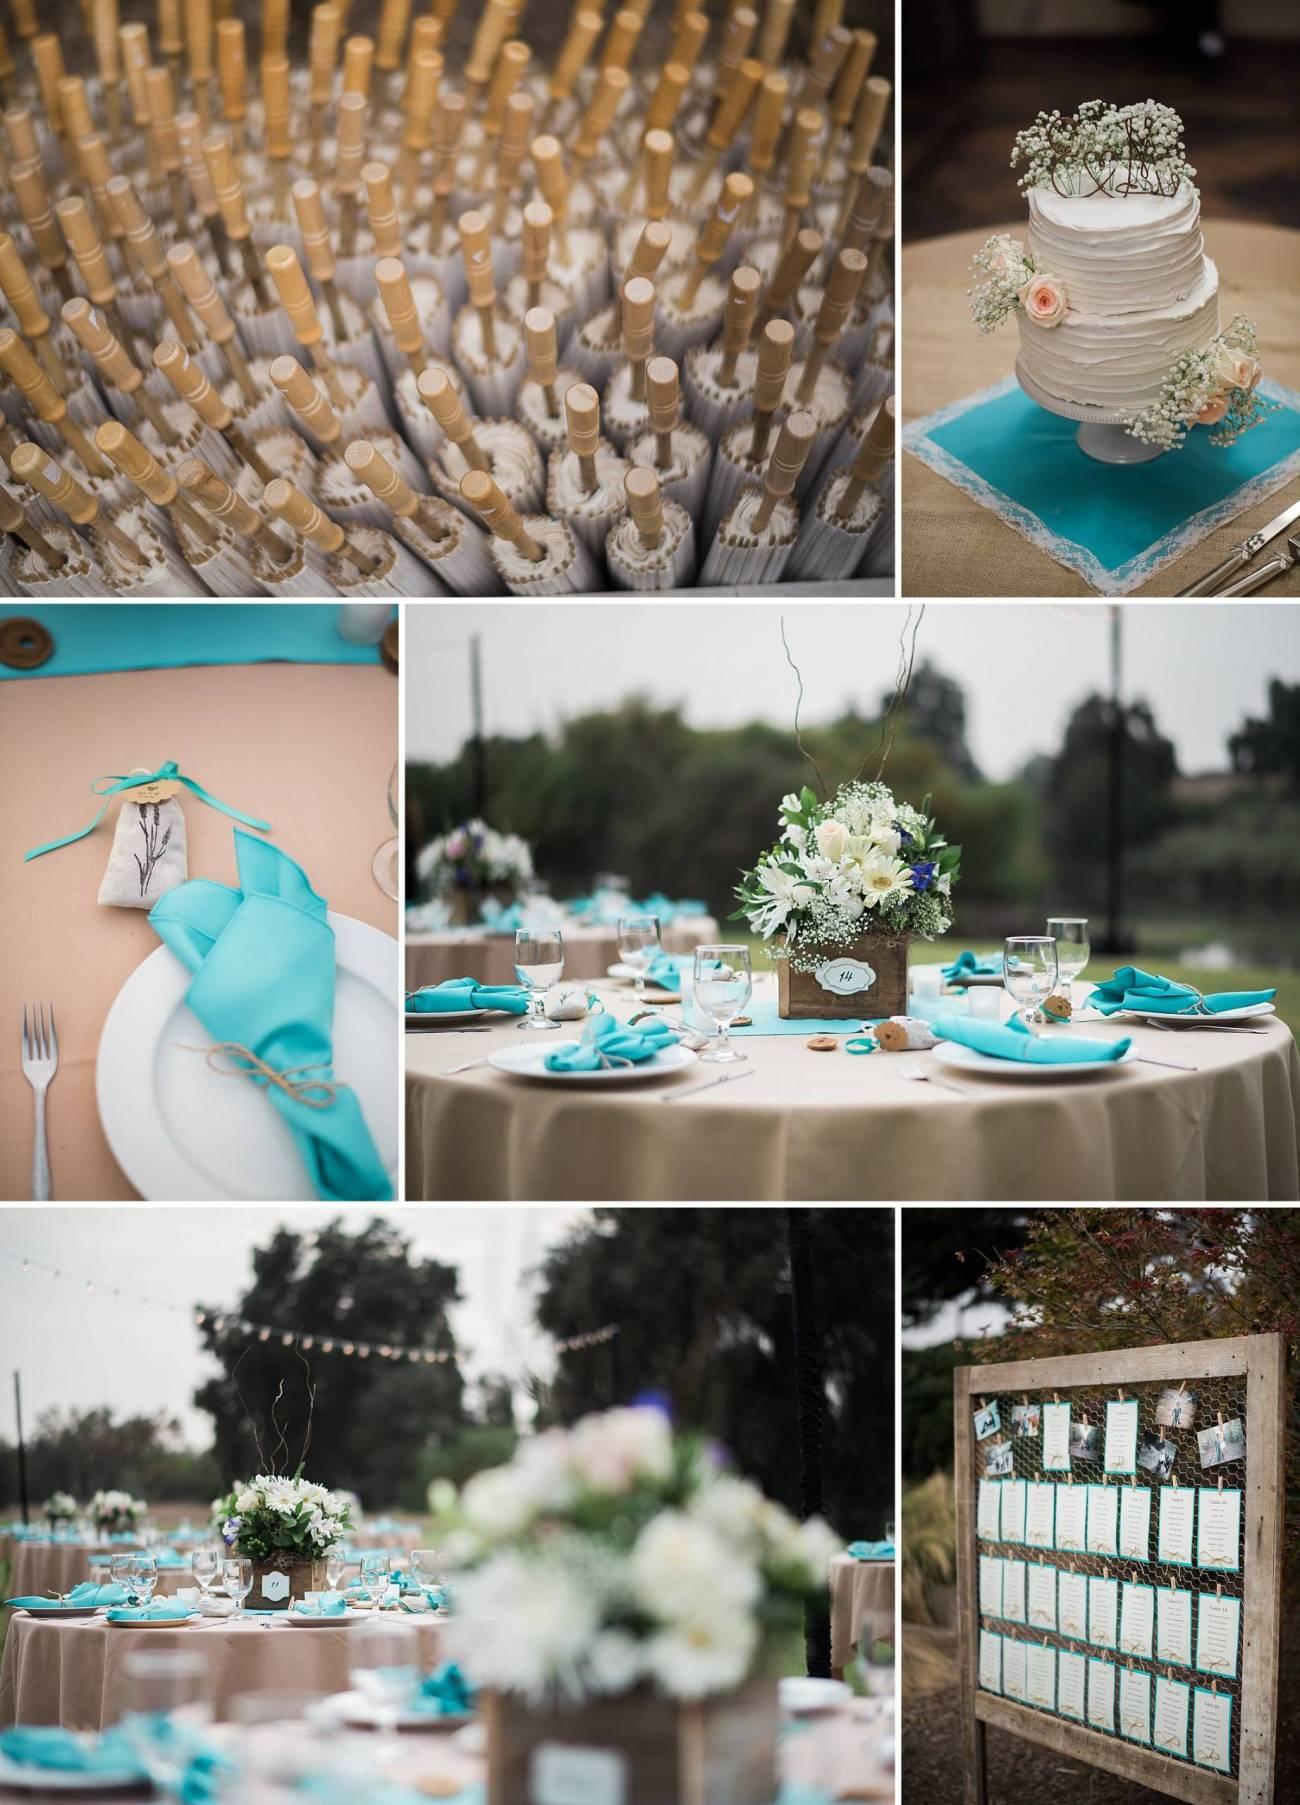 Erin + Marcel Third Element Photography & Cinema Fresno County Estate Wedding Hybrid Film Wedding Photographer_0049